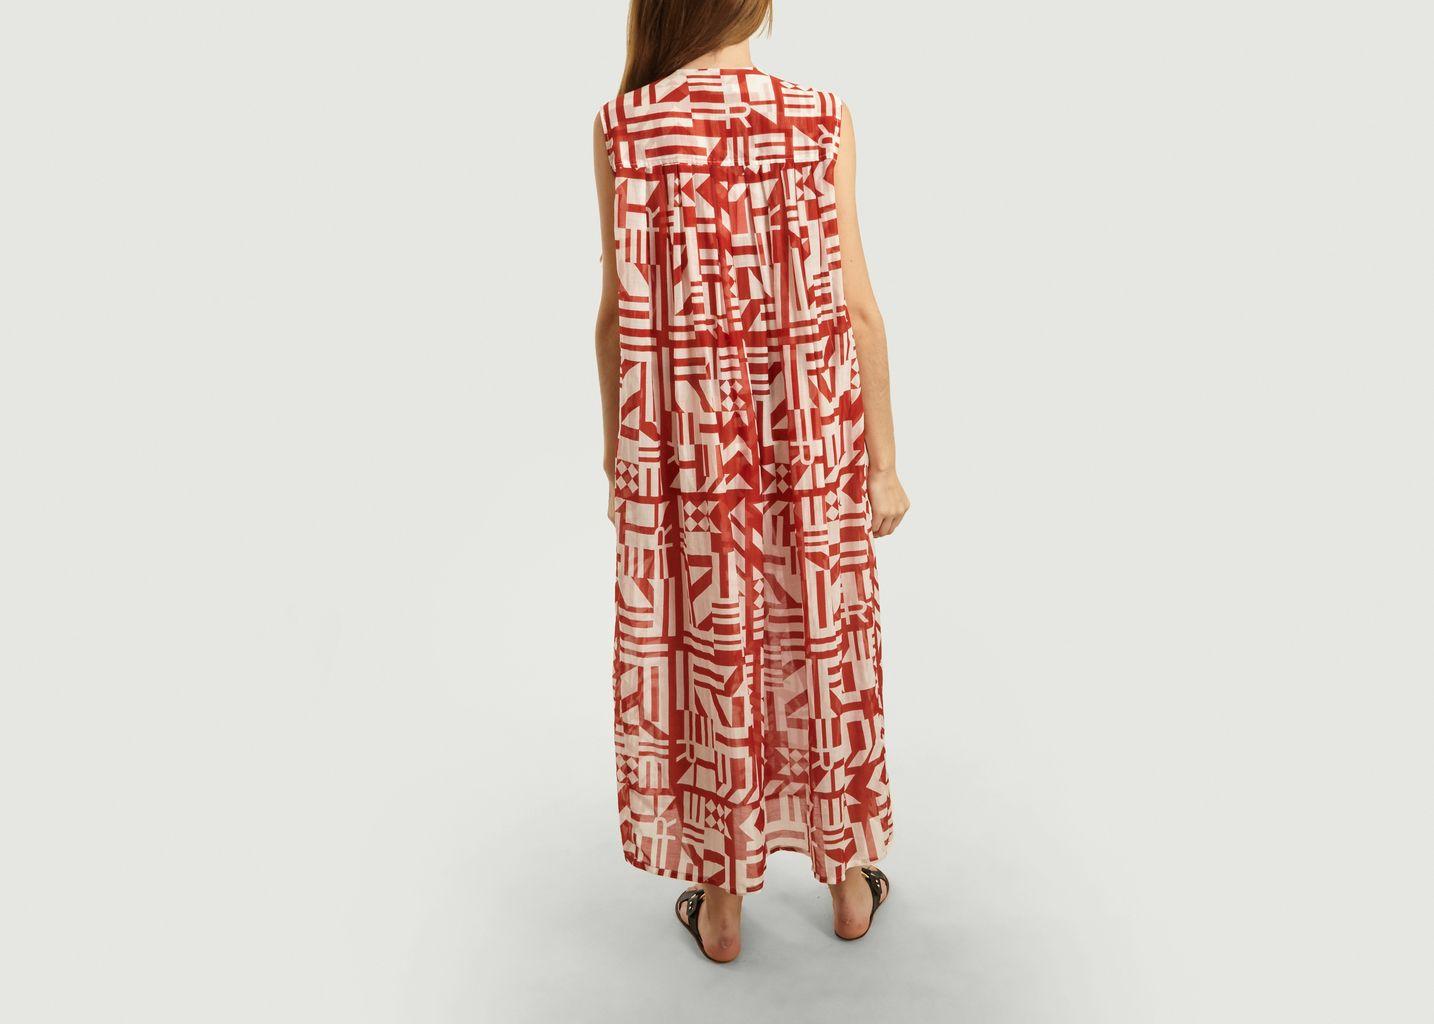 Robe Slow Imprimé Graphique - Roseanna